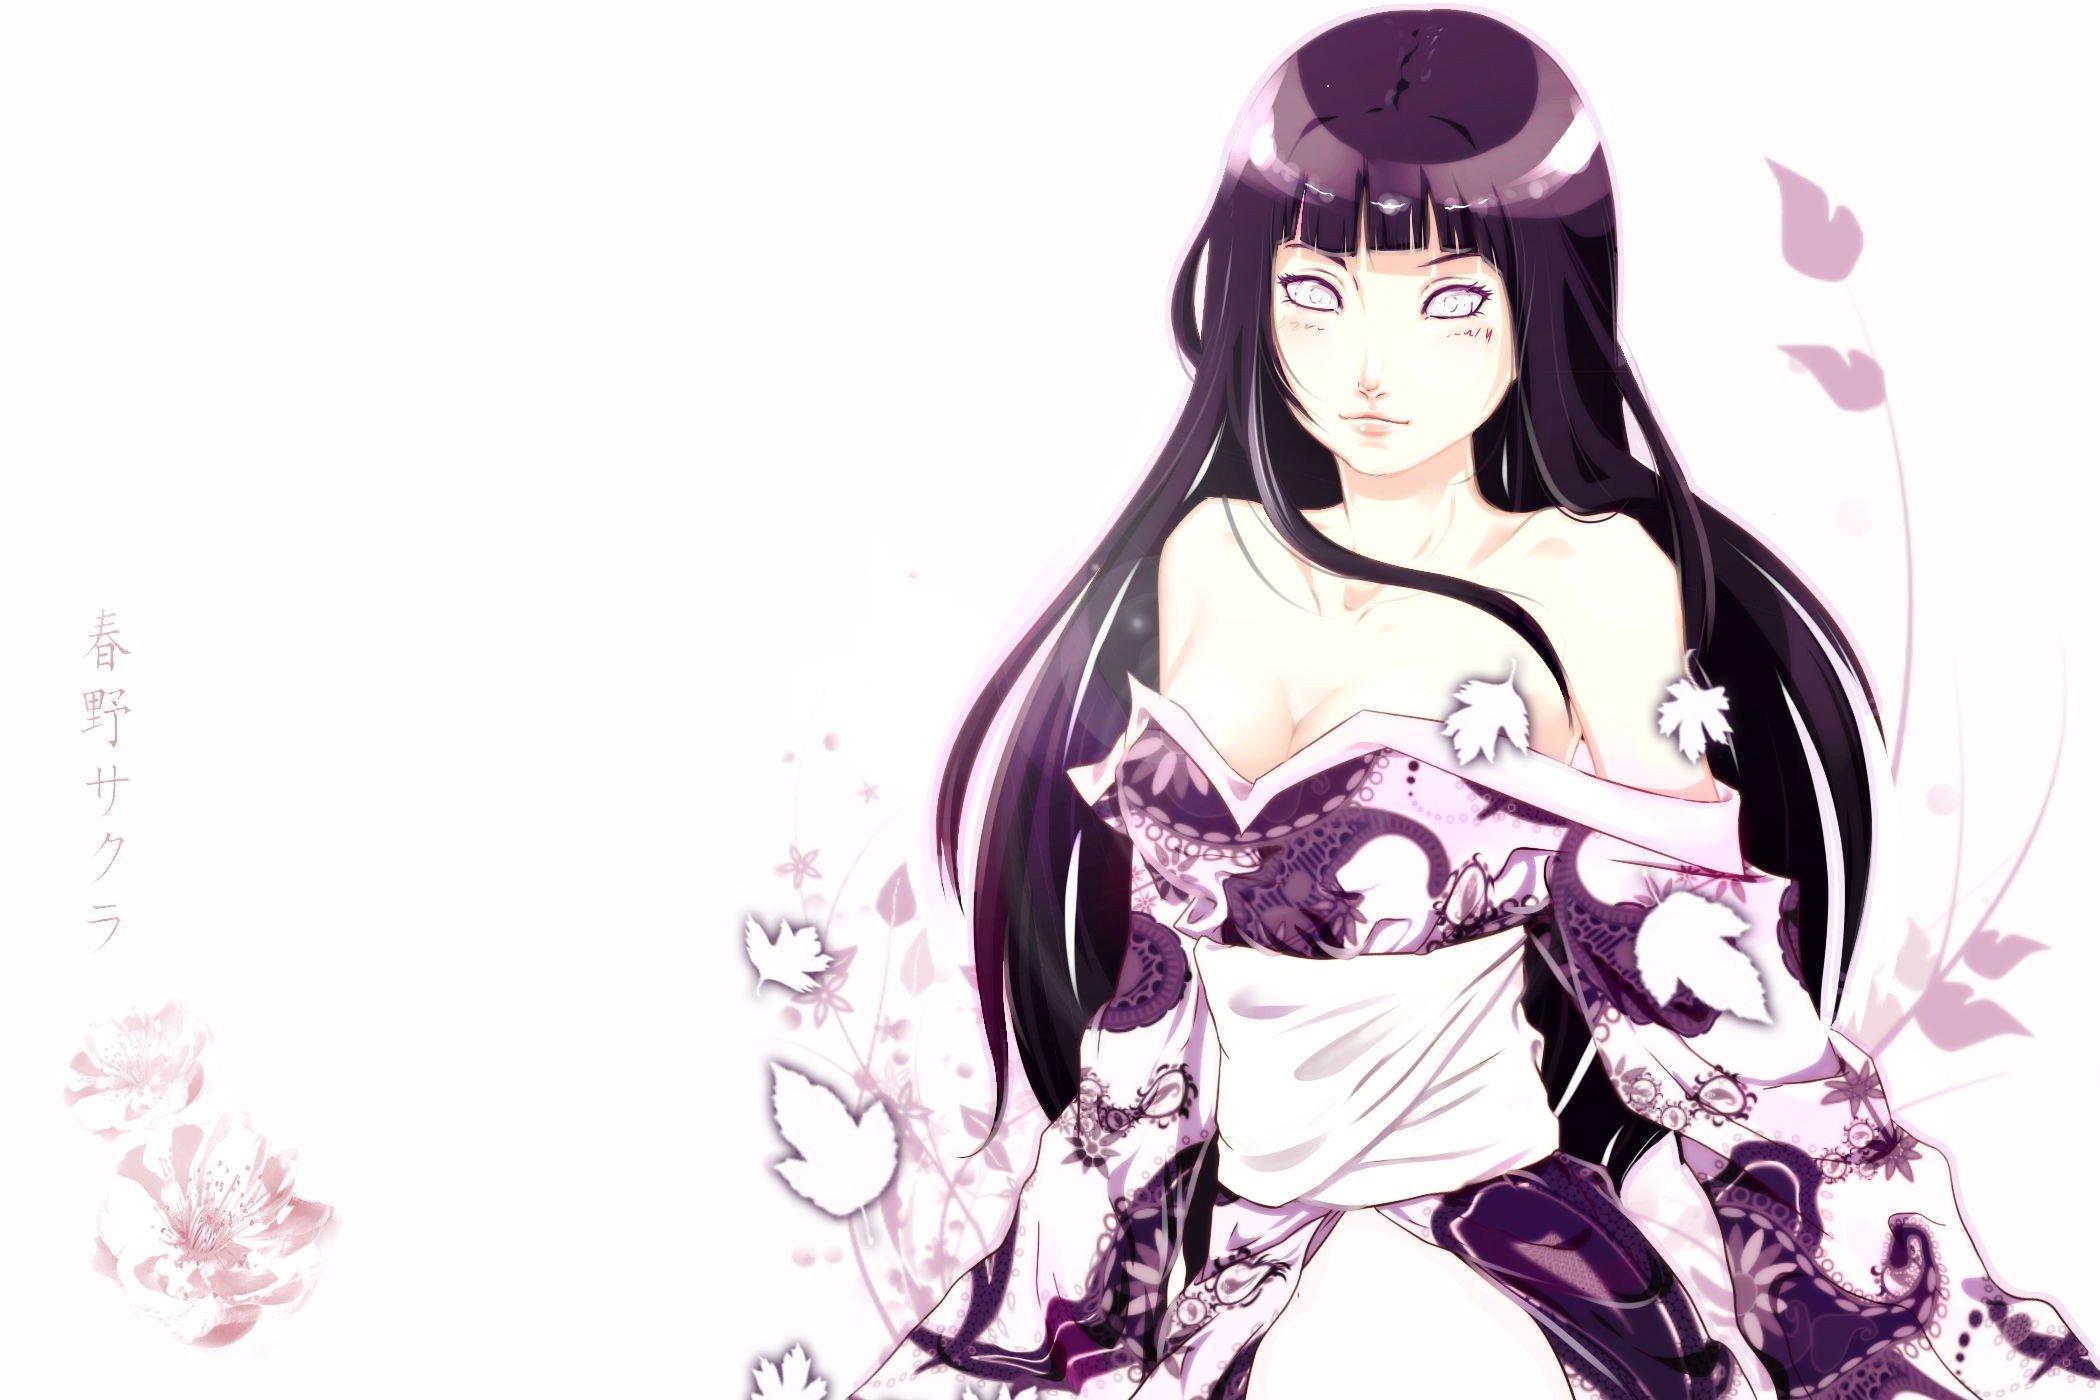 Naruto Shippuuden, Anime, Manga, Hyuuga Hinata, Anime girls Wallpaper